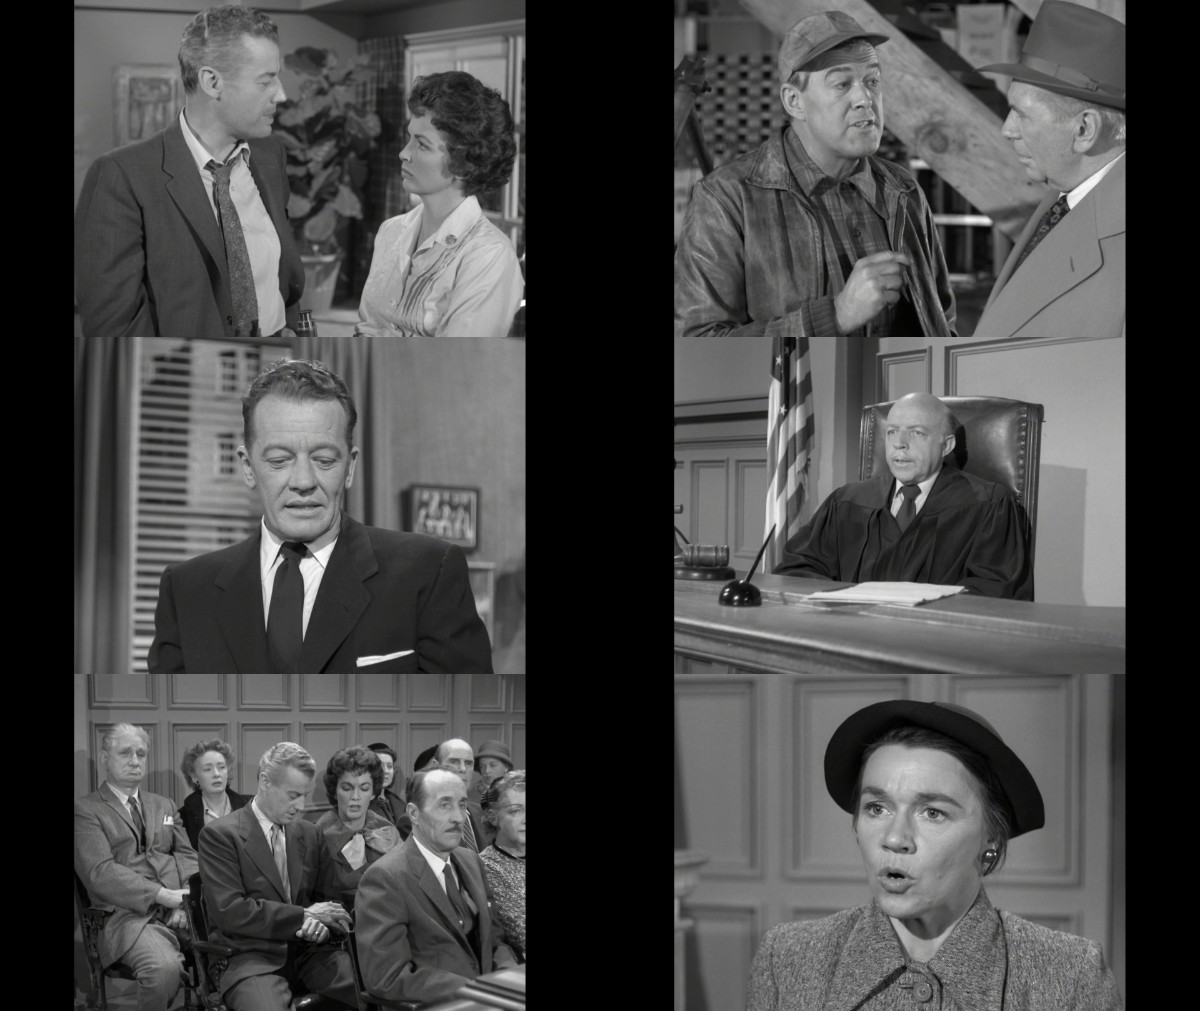 Perry Mason S01E22 1080p WEB h264-DiRT